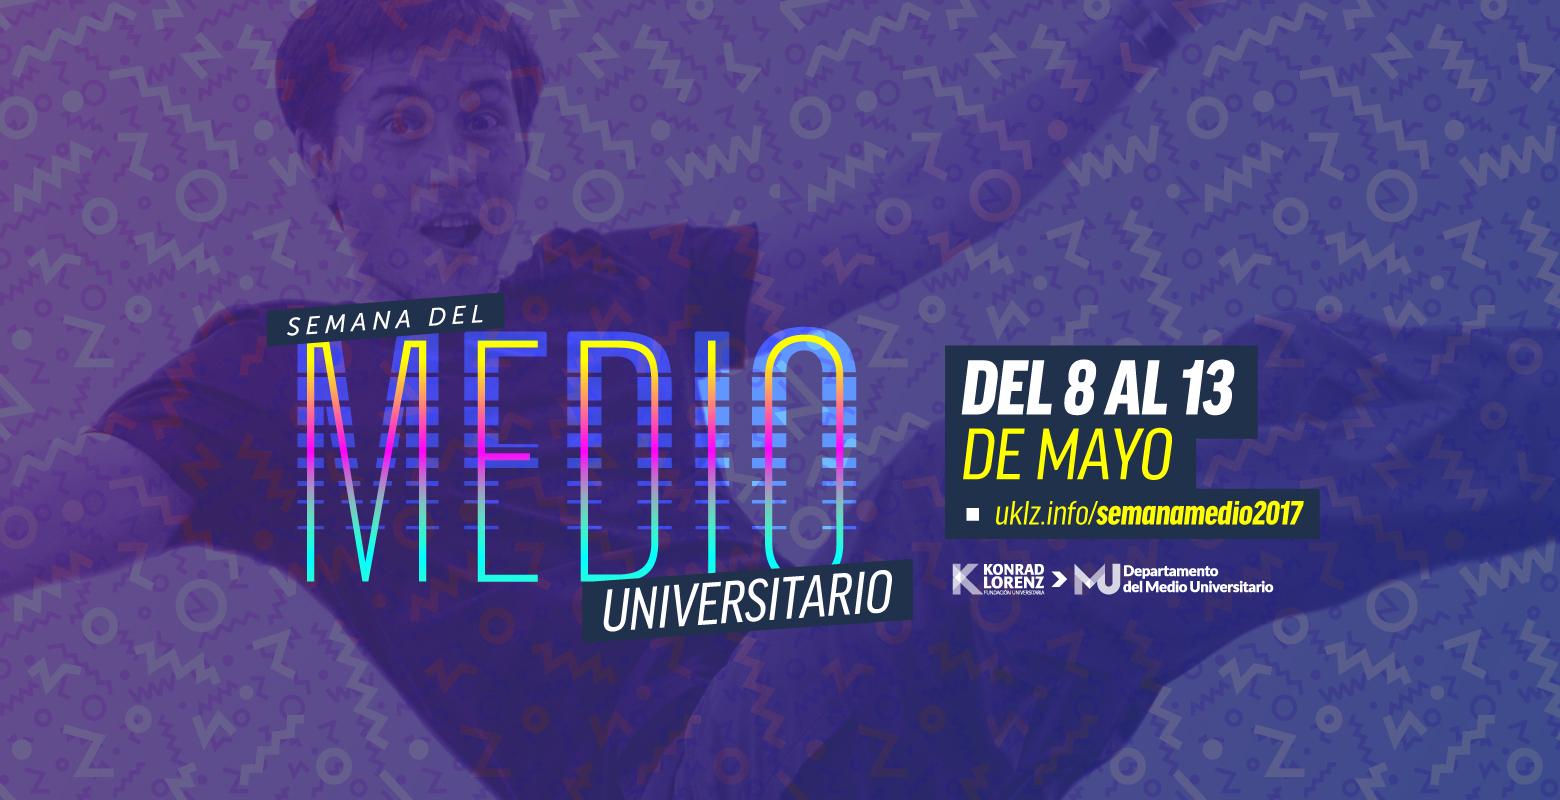 Semana del Medio Universitario 2017-1